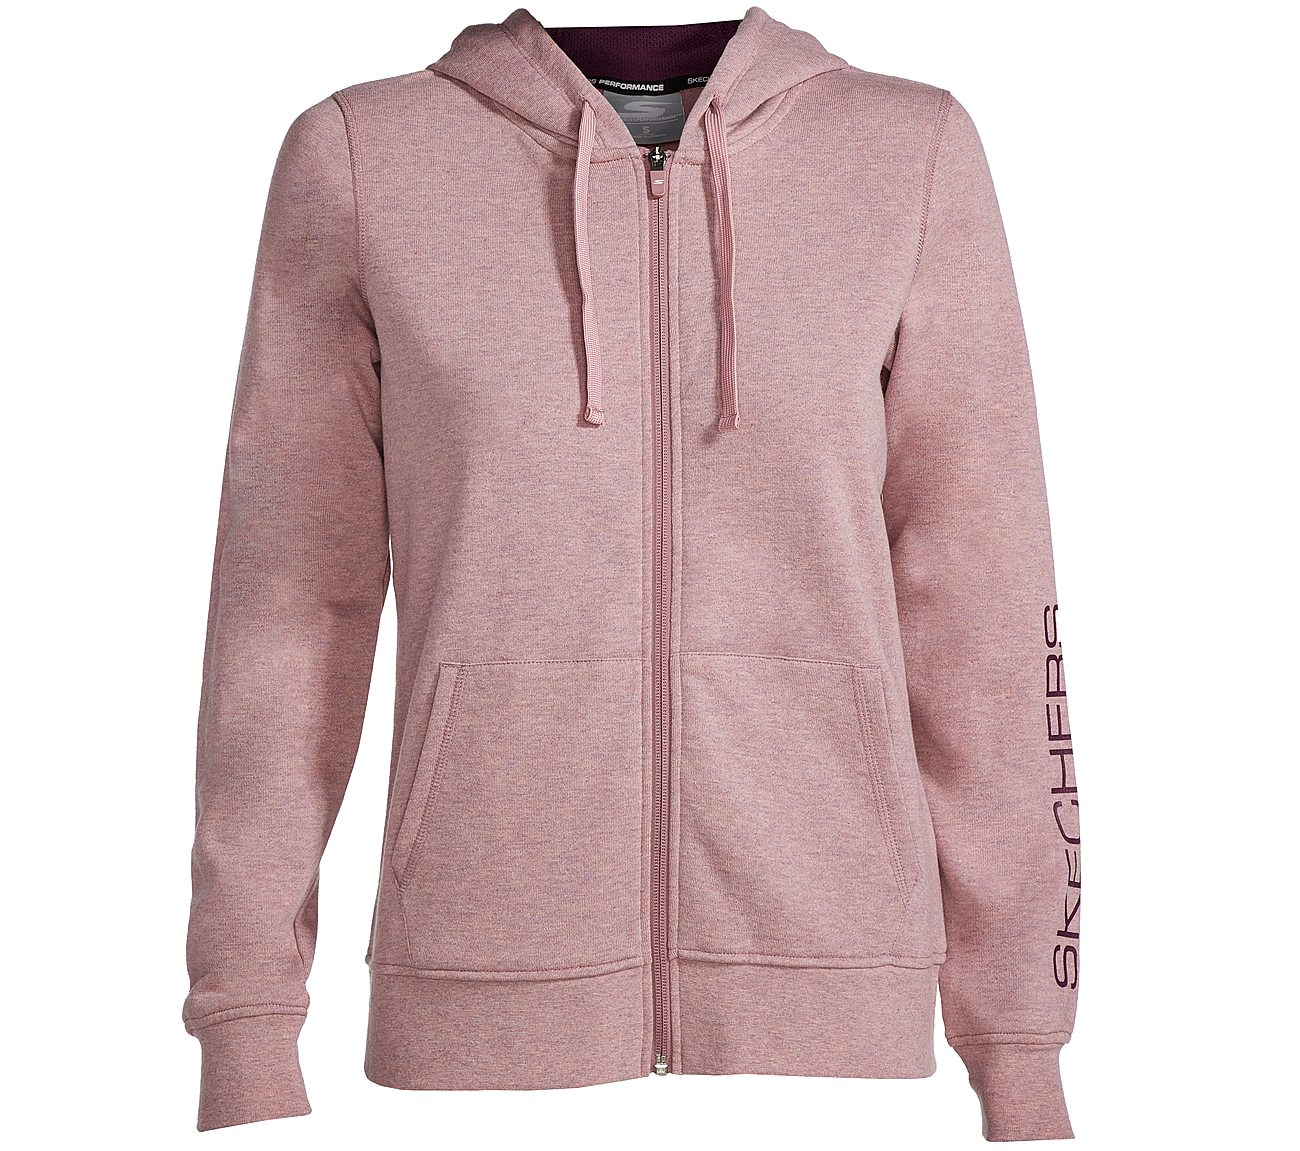 Buy SKECHERS Slumber Zip Hoodie Jackets